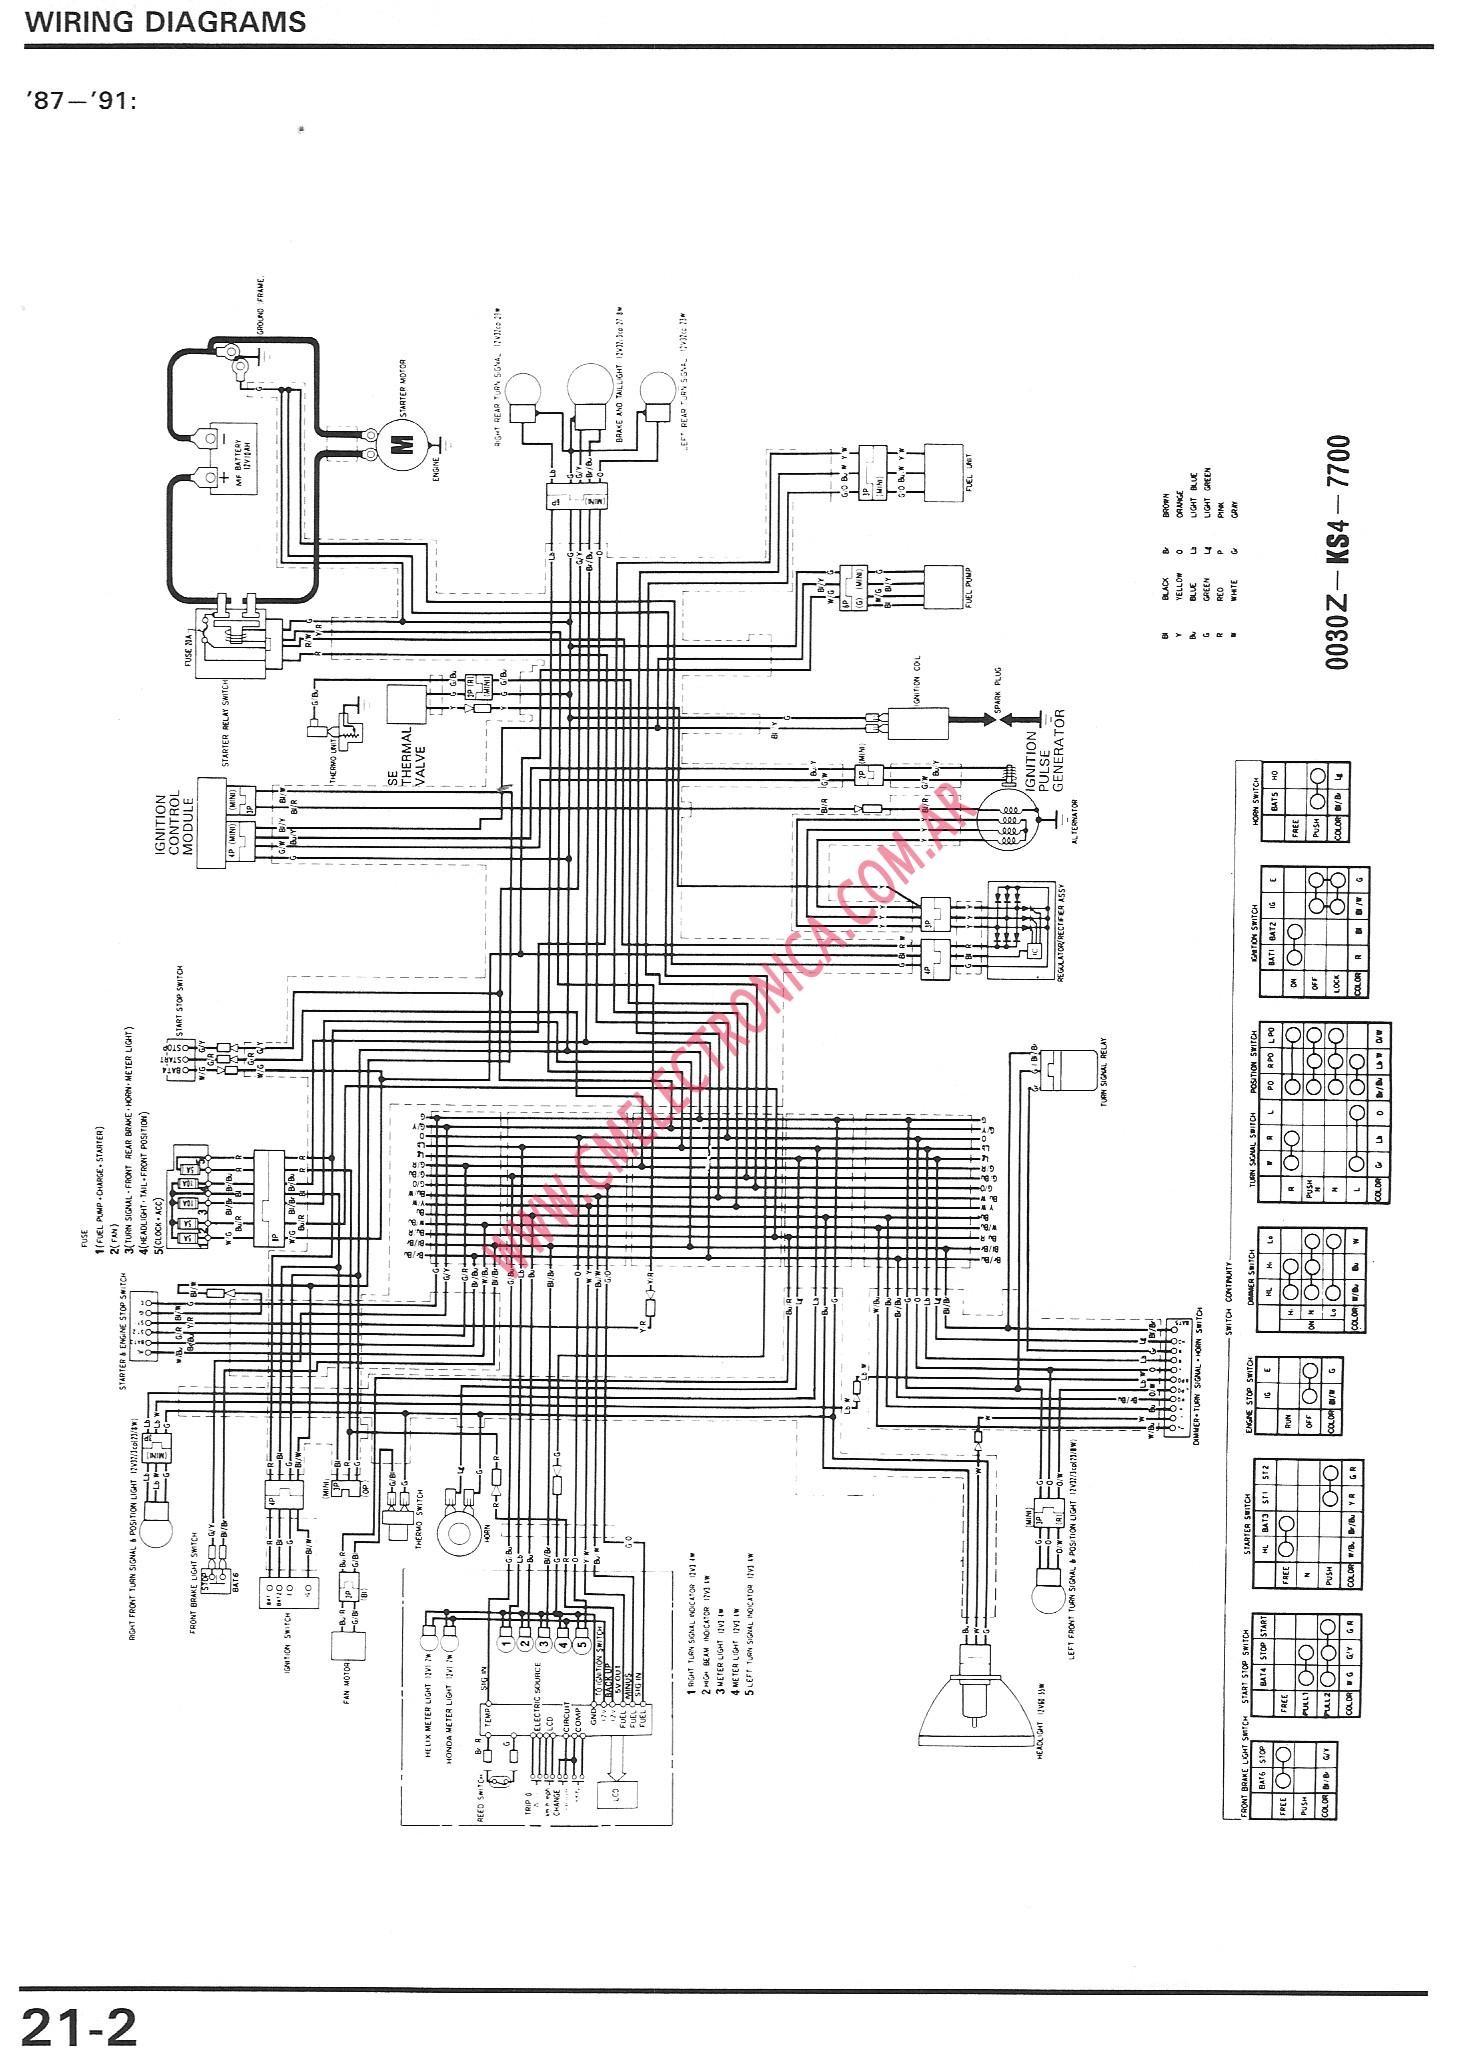 B88c57 Wiring Diagram For Daihatsu Charade Wiring Library